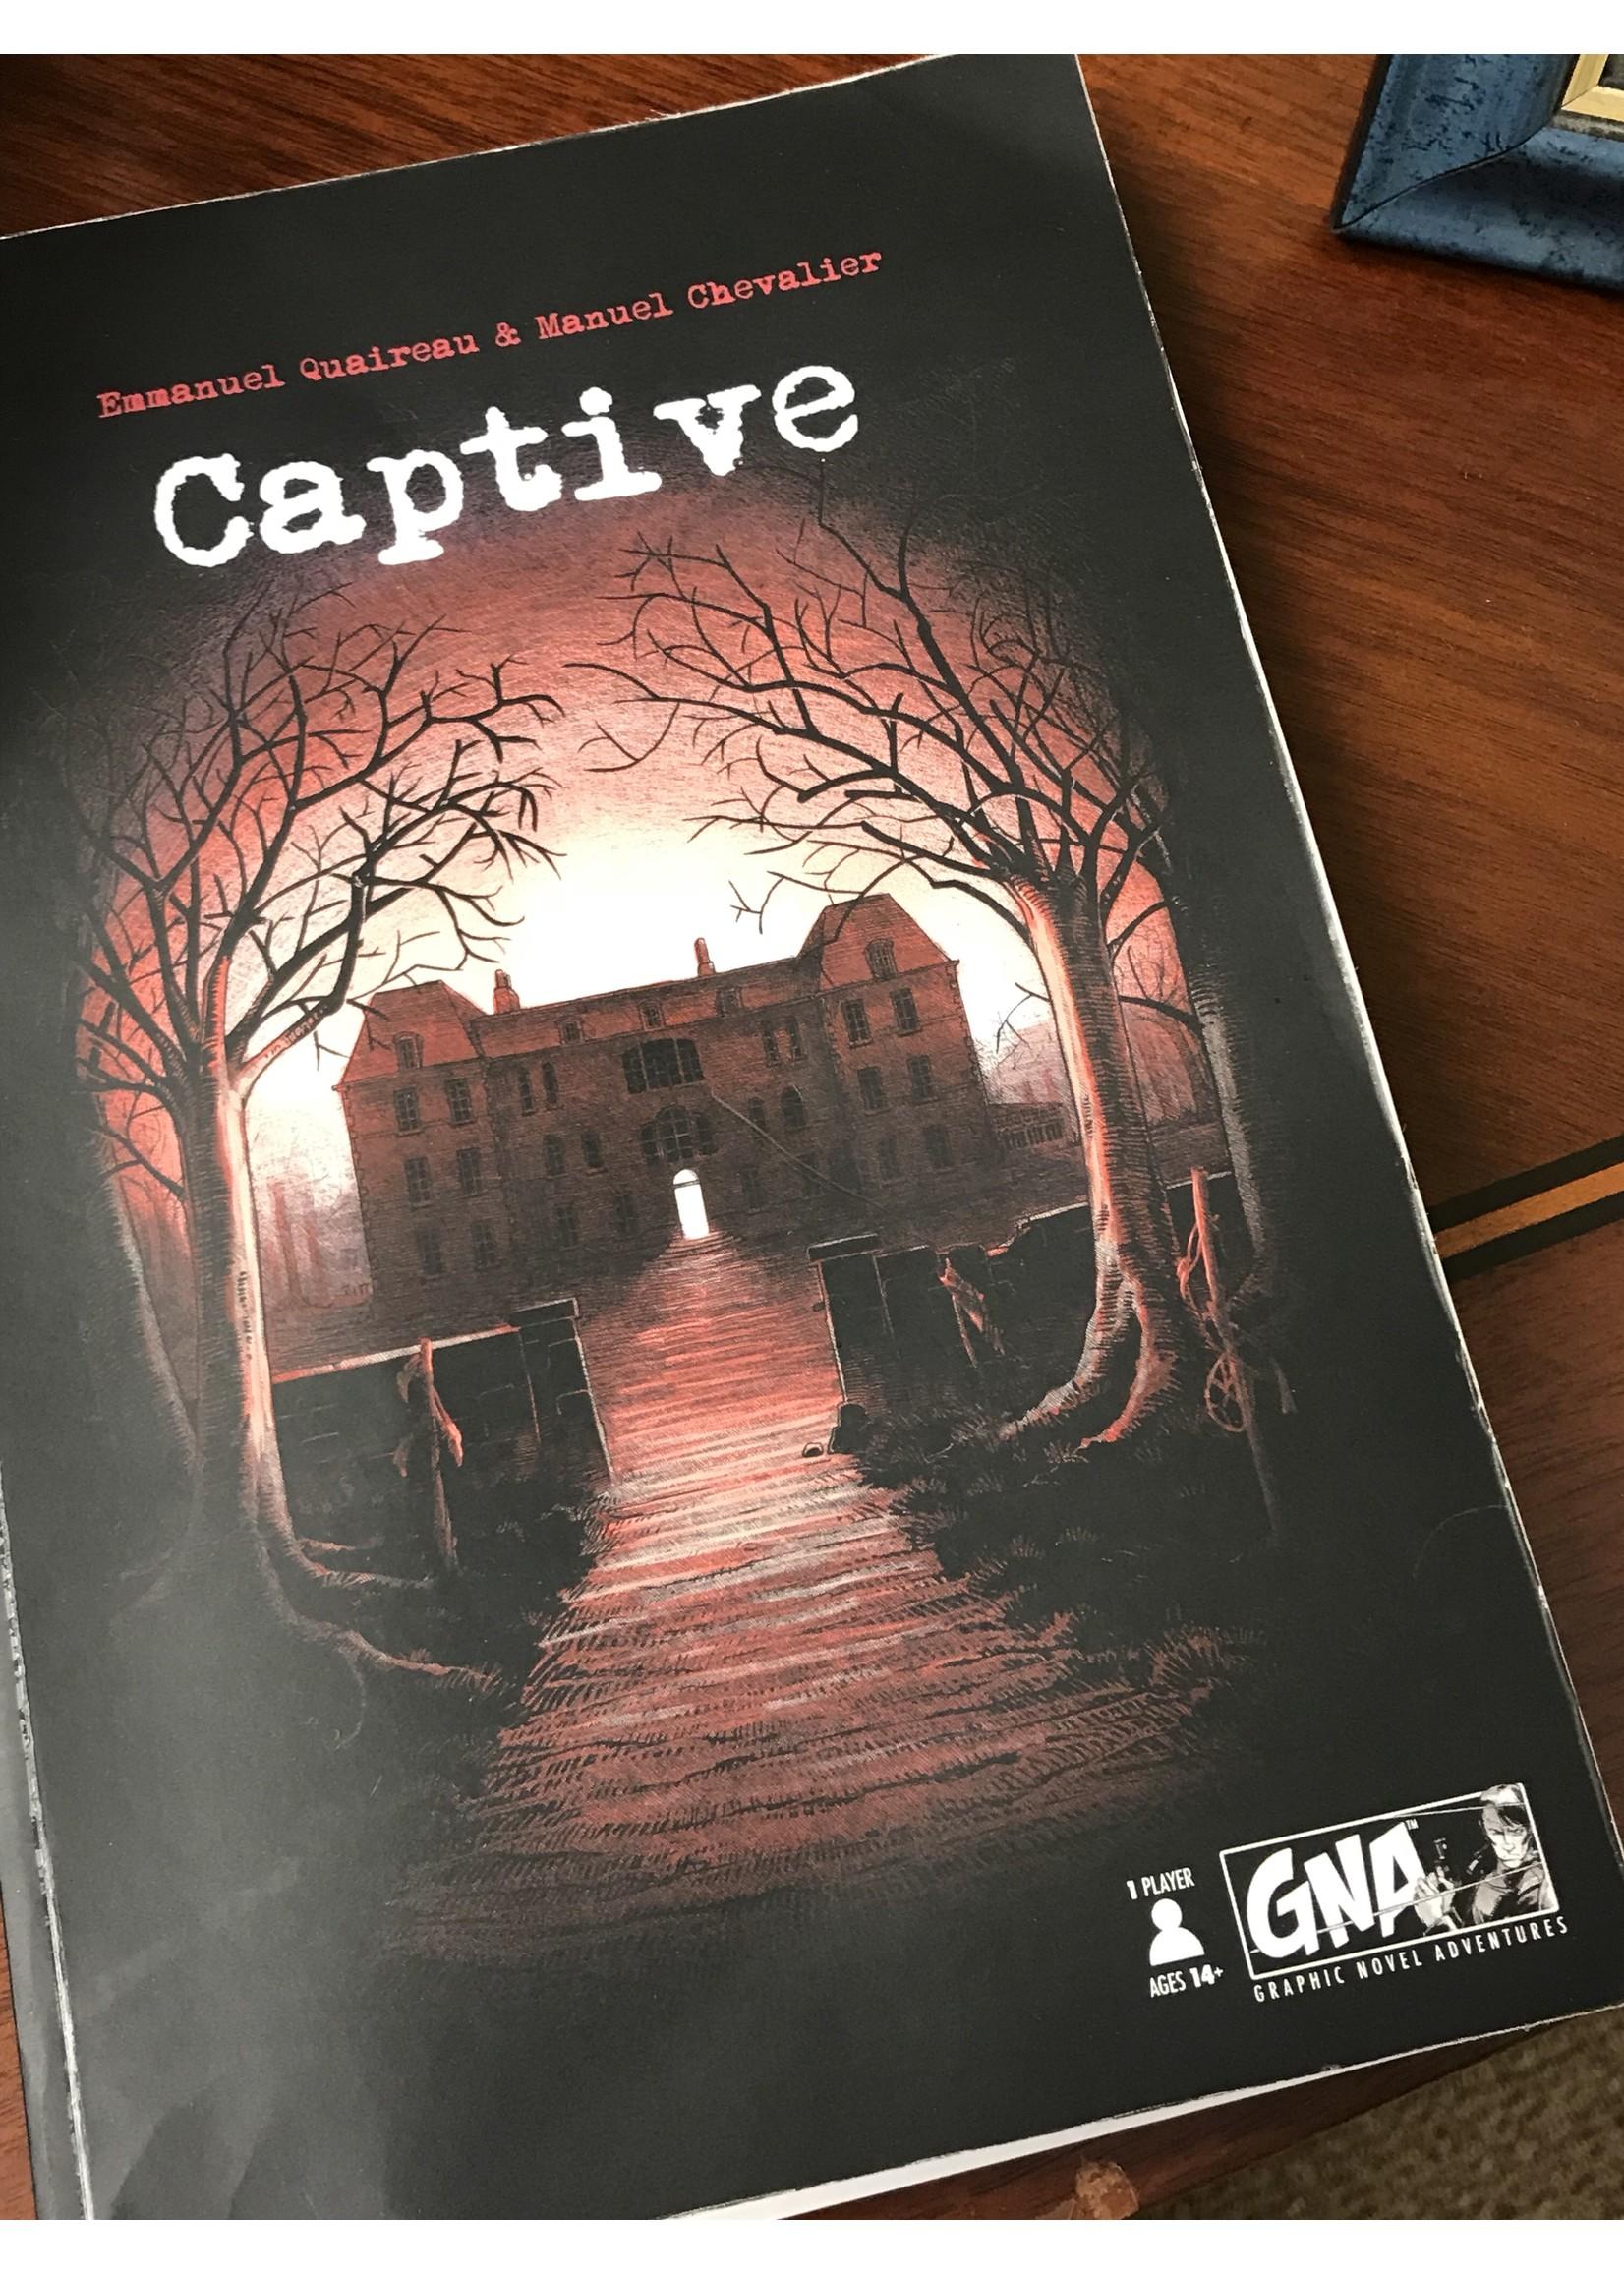 Captive - Graphic Novel Adventure